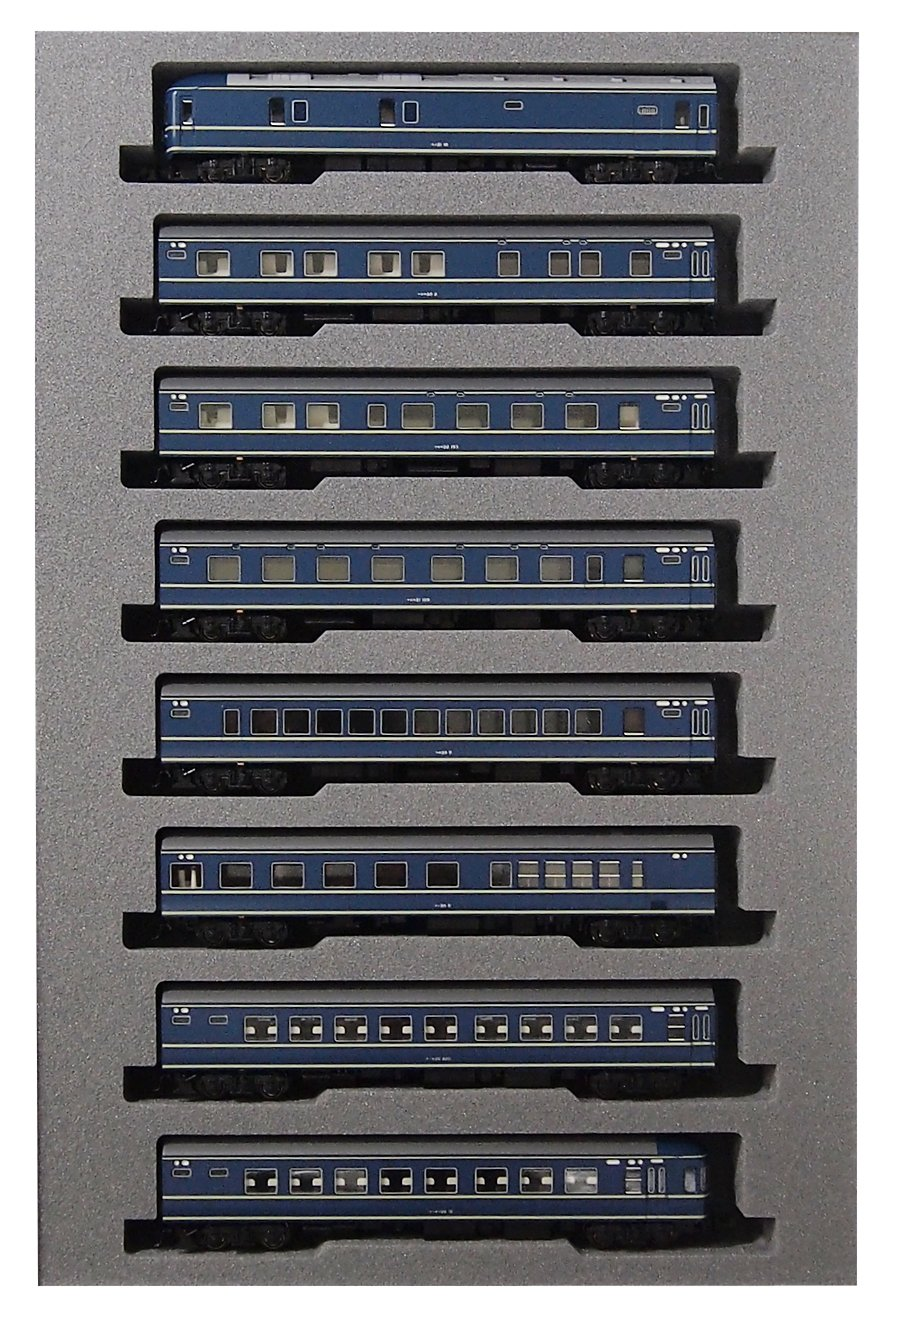 KATO Nゲージ 20系 寝台特急あさかぜ 基本 8両セット 10-1321 鉄道模型 客車 B0154MCUK6